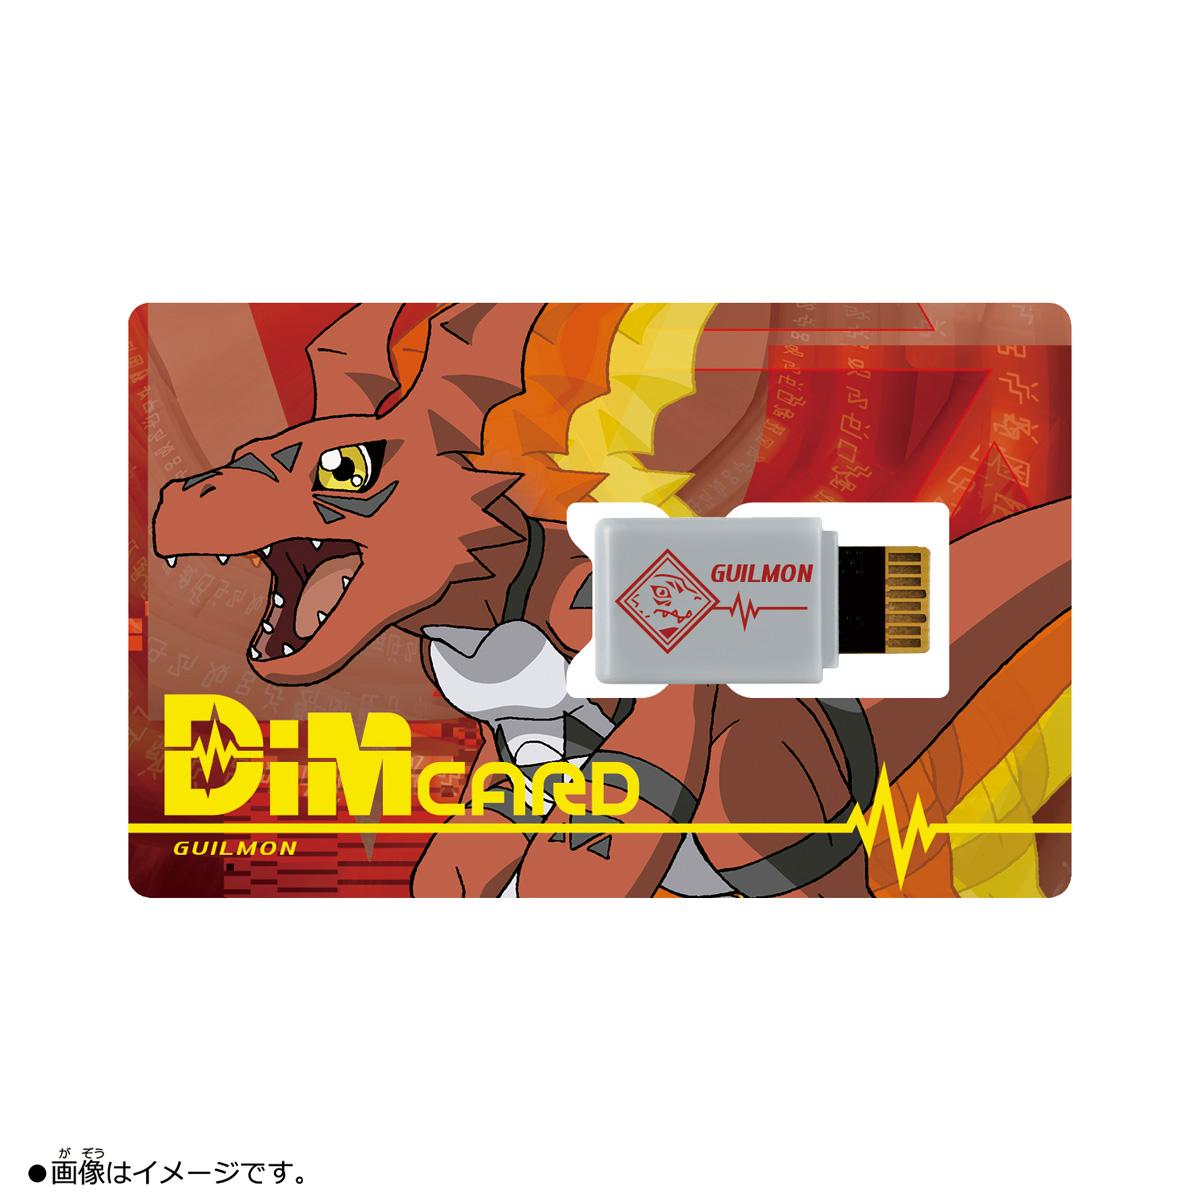 BANDAI|數碼寶貝記憶卡 EX2 馴獸師之王Ver. 基爾獸